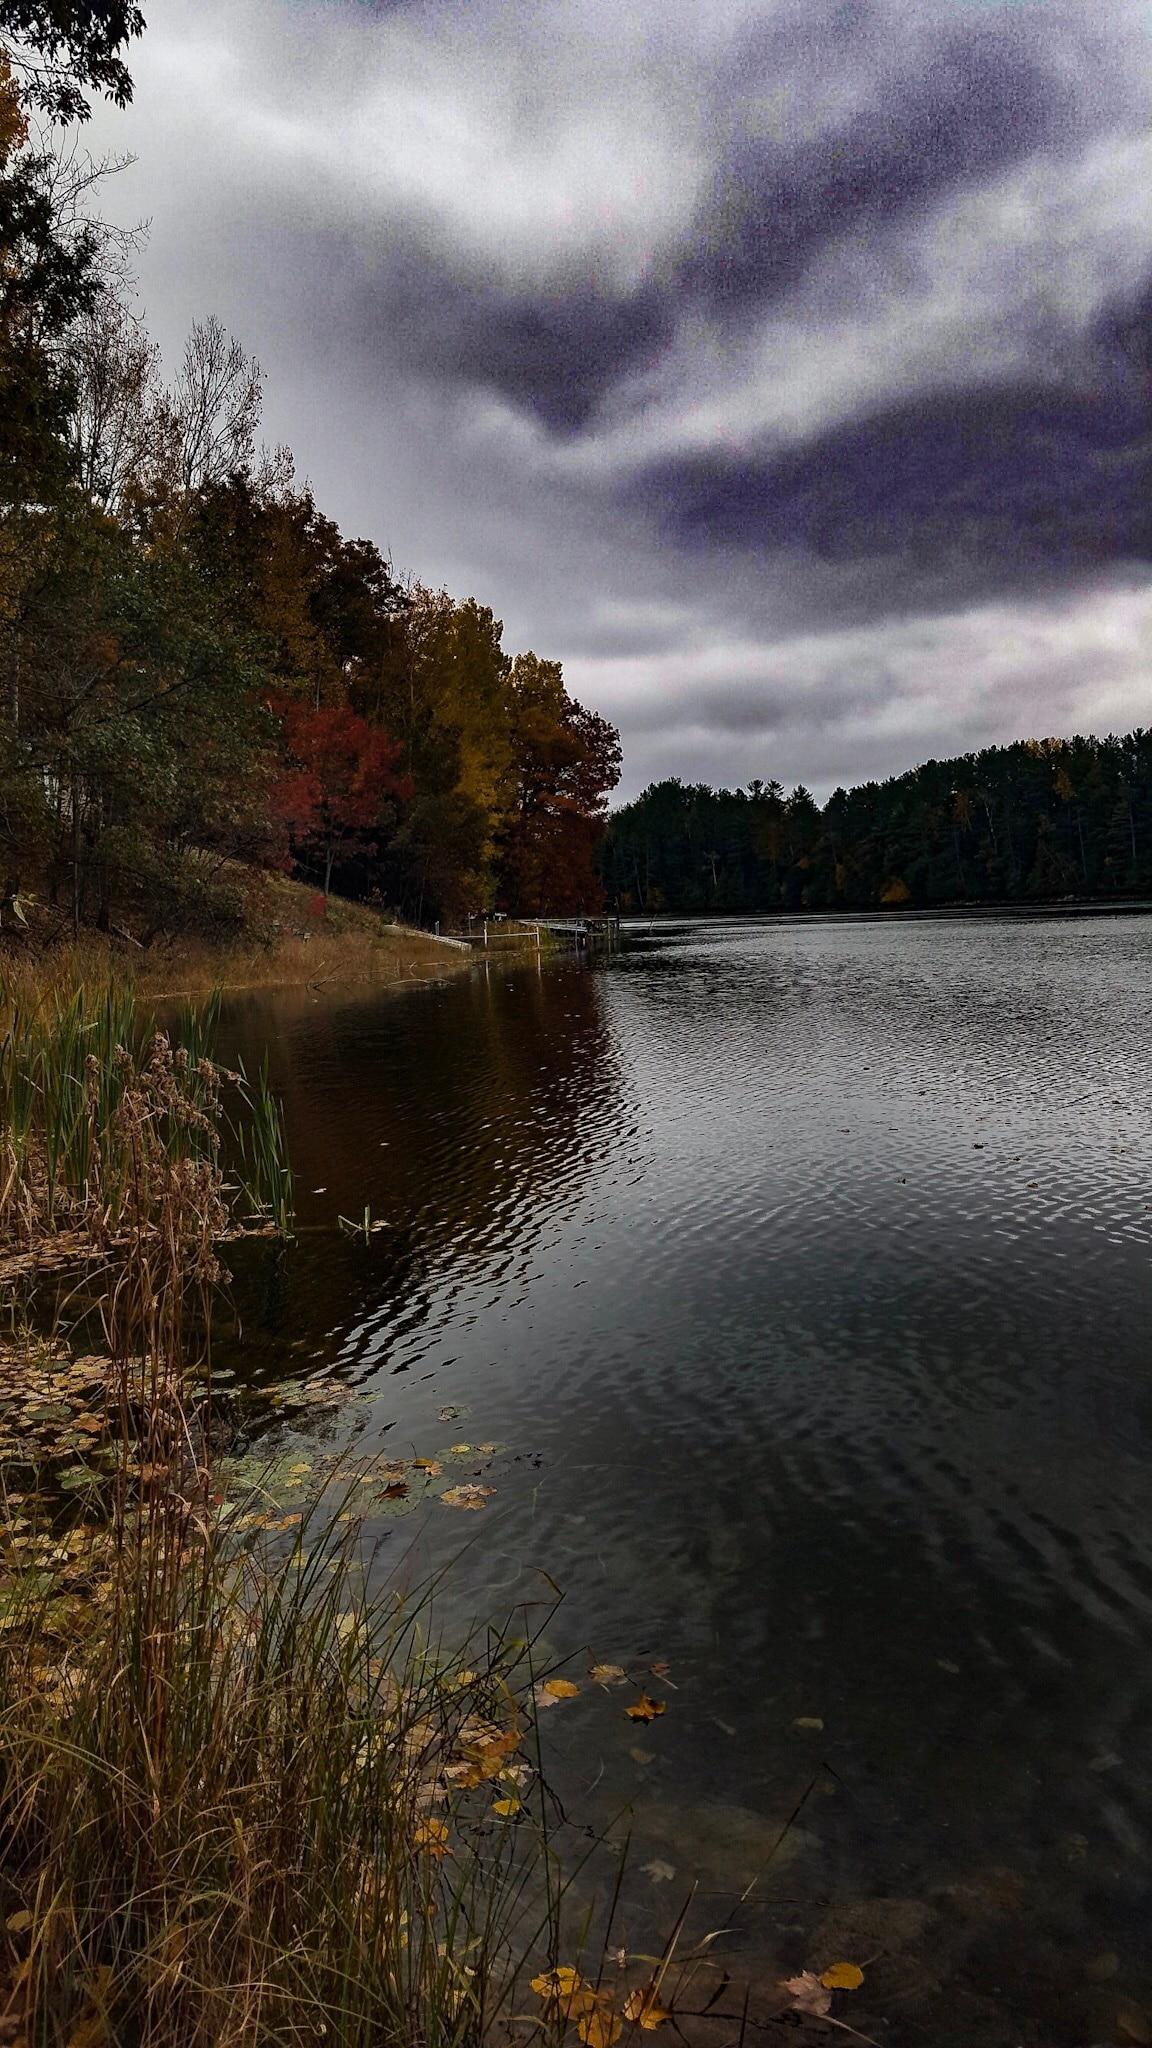 White Lake, Wisconsin, United States of America